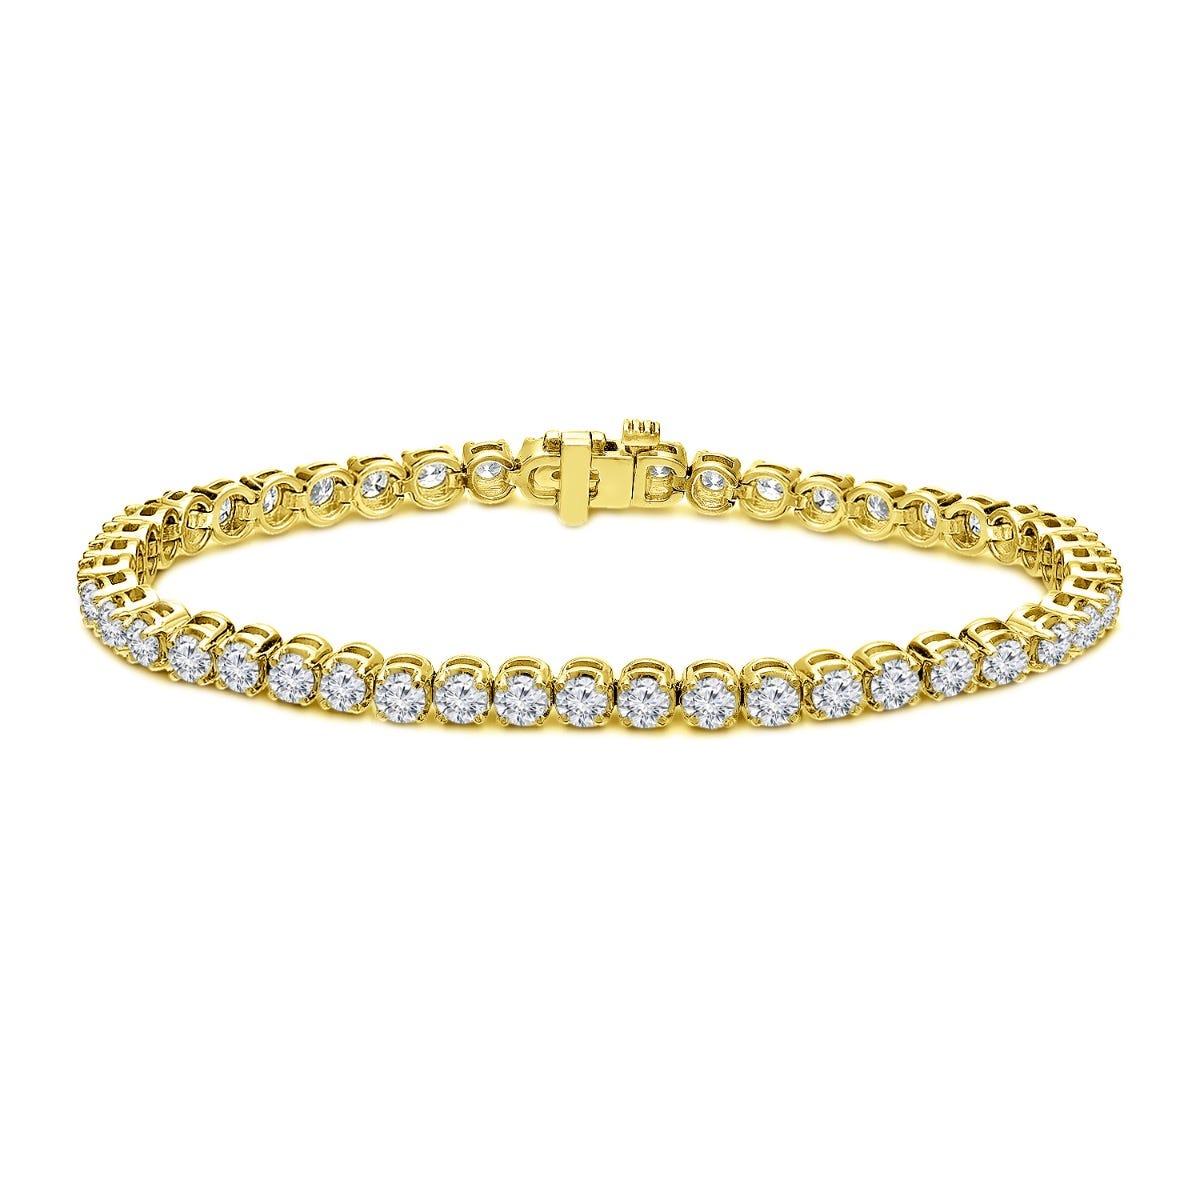 6ctw. 4-Prong Round Link Diamond Tennis Bracelet in 14K Yellow Gold  (IJ, I1-I2)